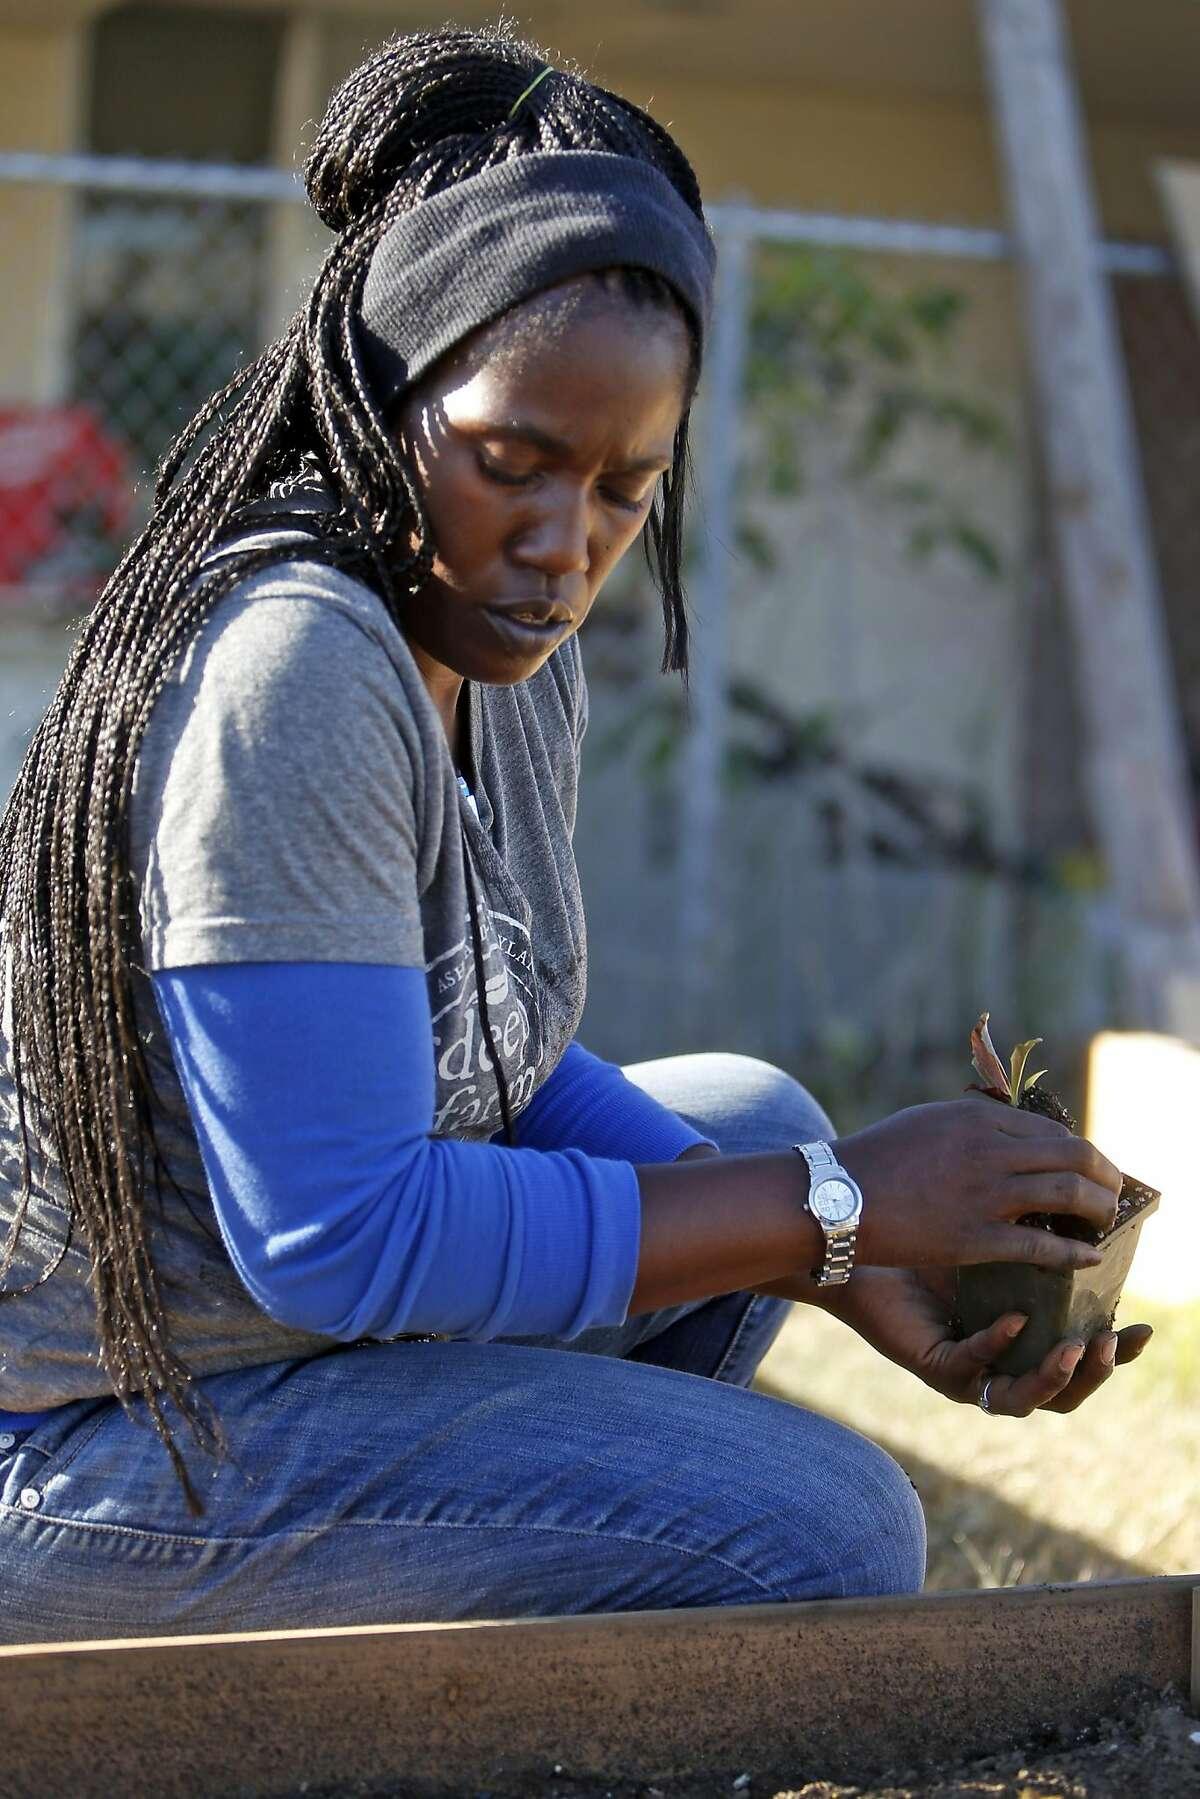 Yolanda Bowden works at Dig Deep Farms' urban farm in San Leandro, Calif., on Thursday, December 22, 2016.